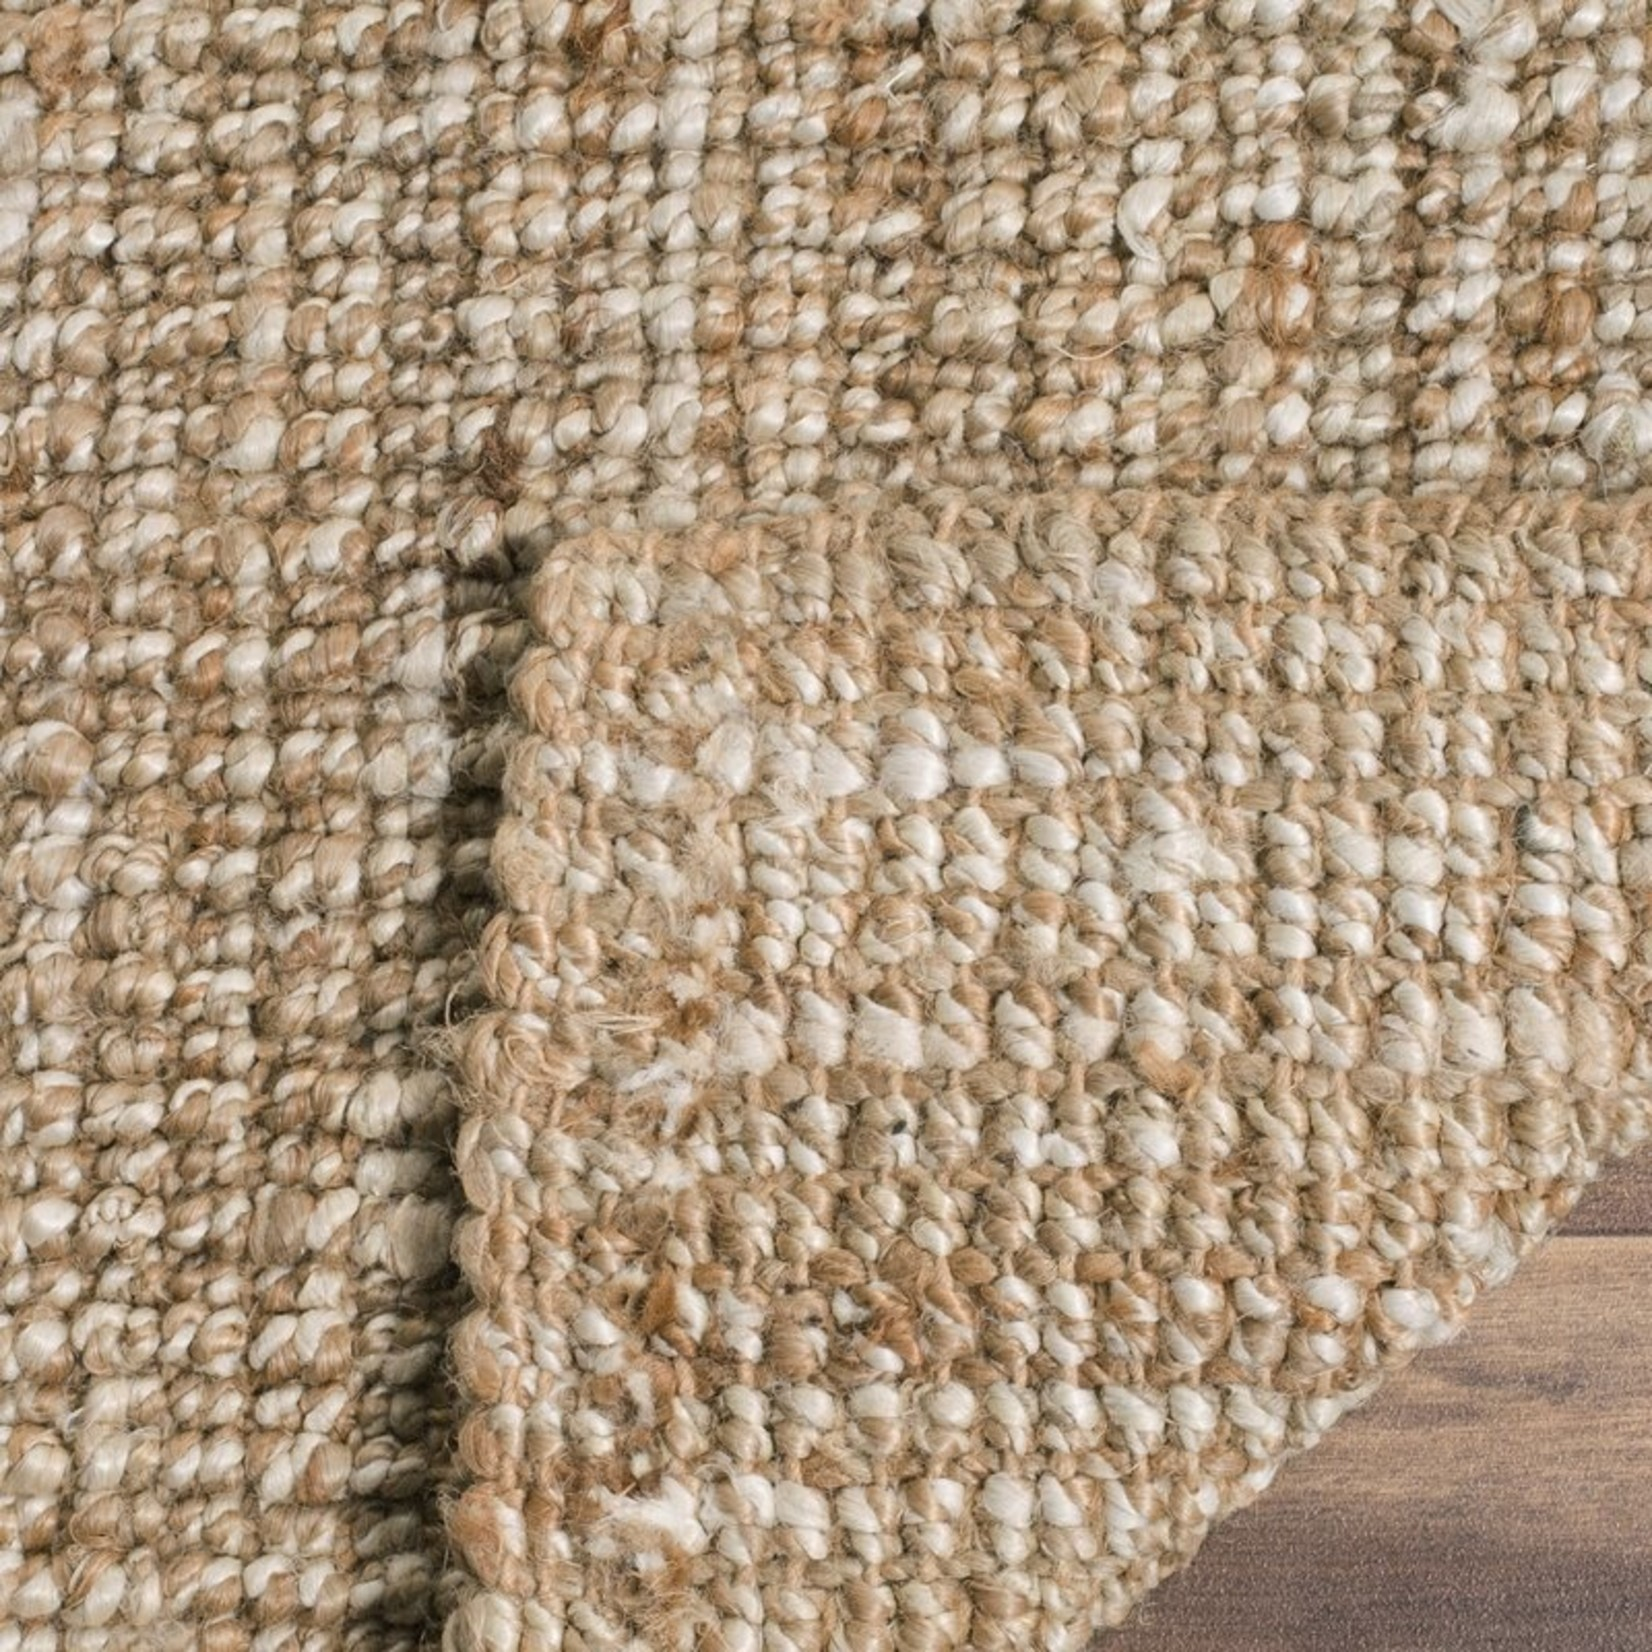 *8' x 10' - Waldenburg Handmade Flatweave Jute/Sisal Beige Area Rug